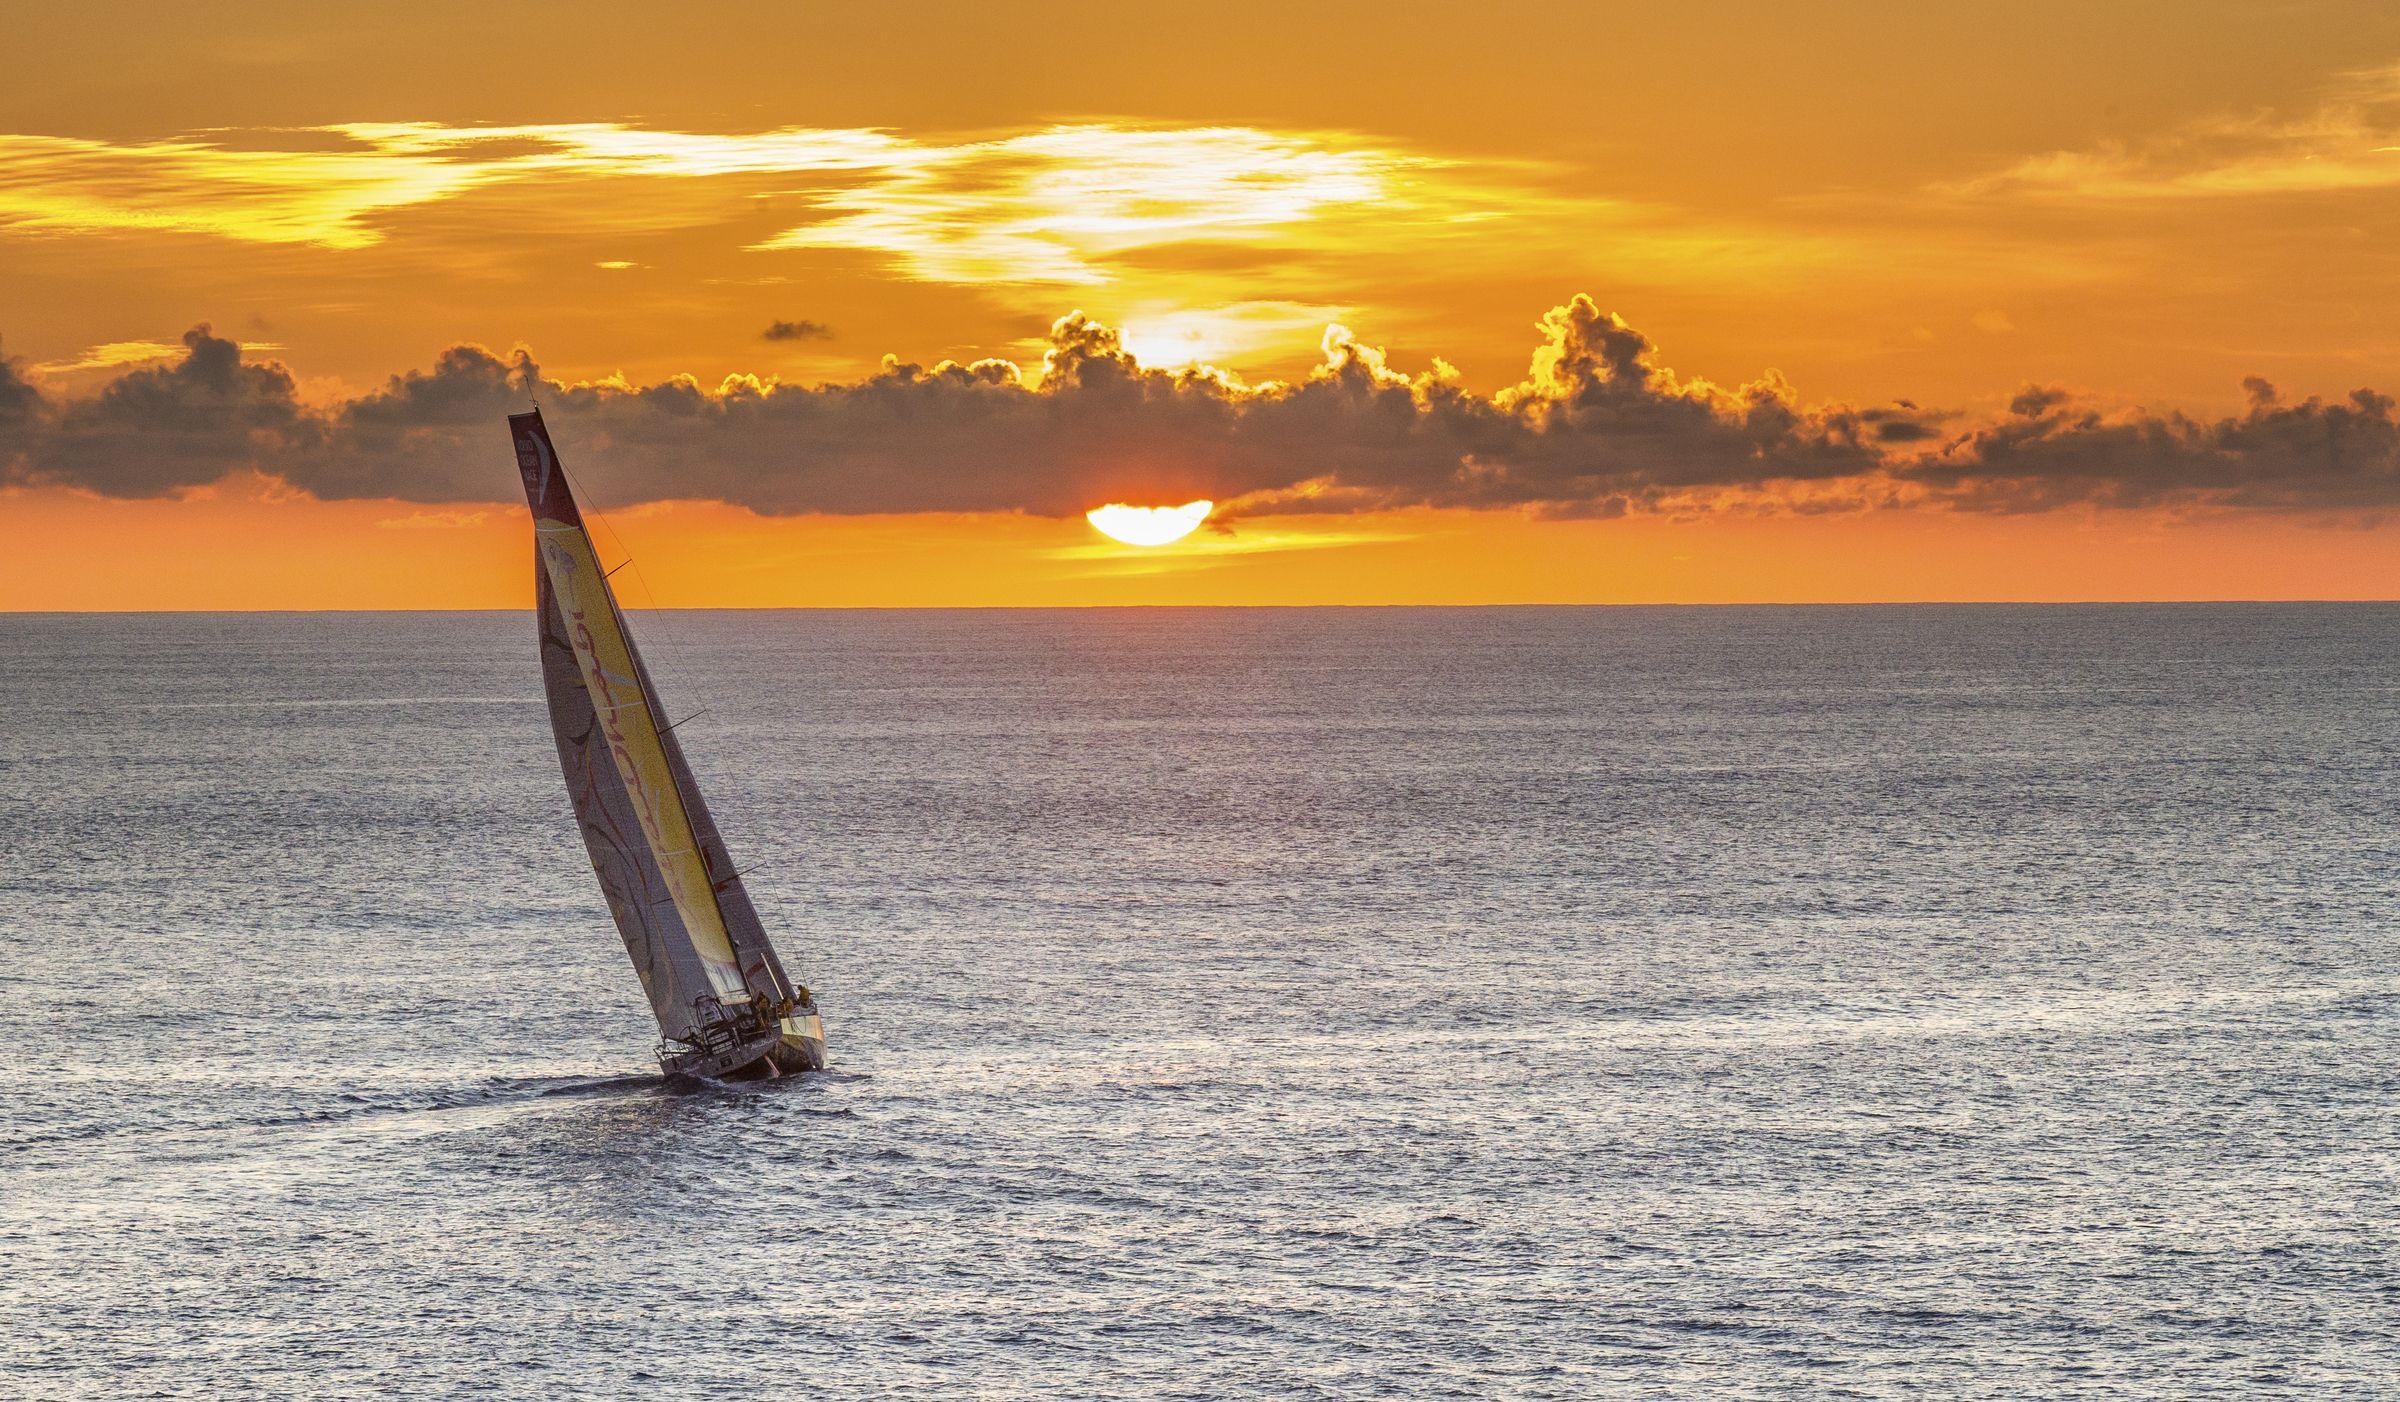 Volvo Ocean Race 201415 Auckland Arrivals 28 February